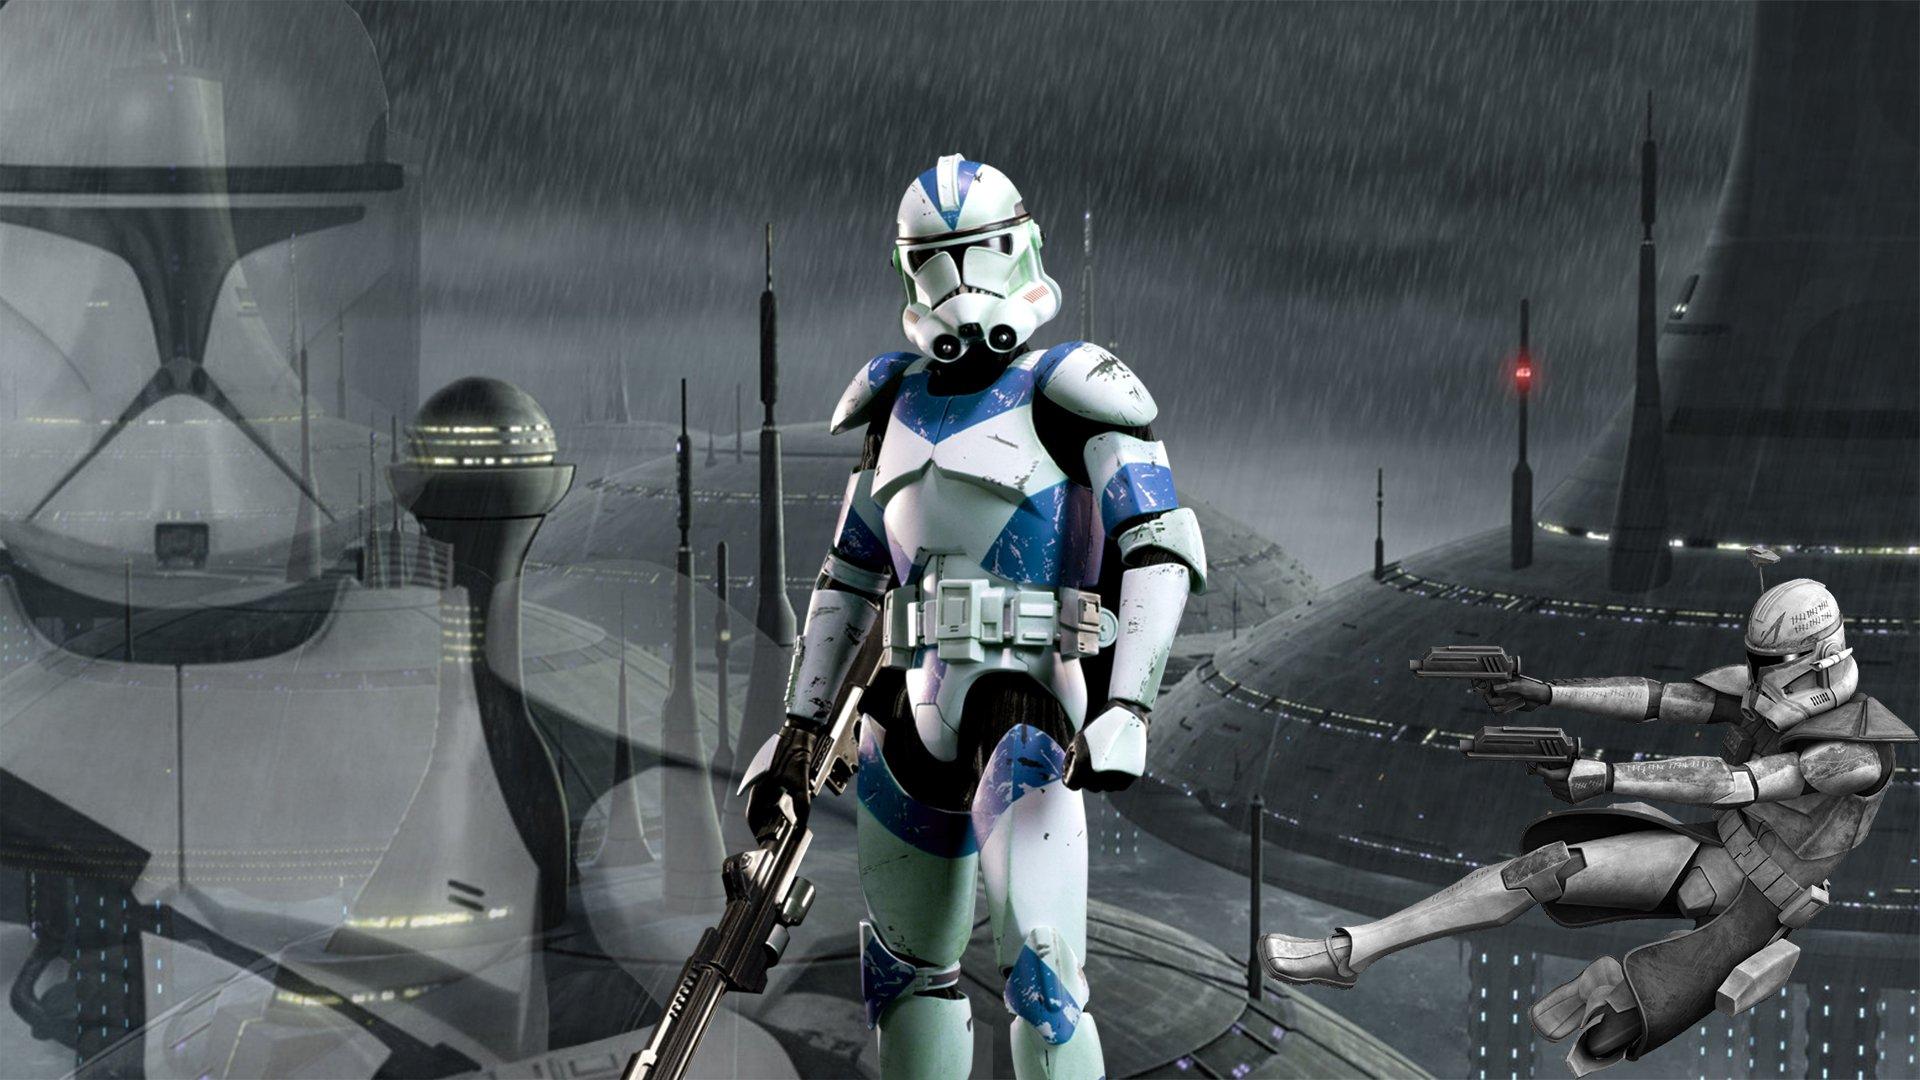 Star Wars Wallpaper Clone 2582818 Hd Wallpaper Backgrounds